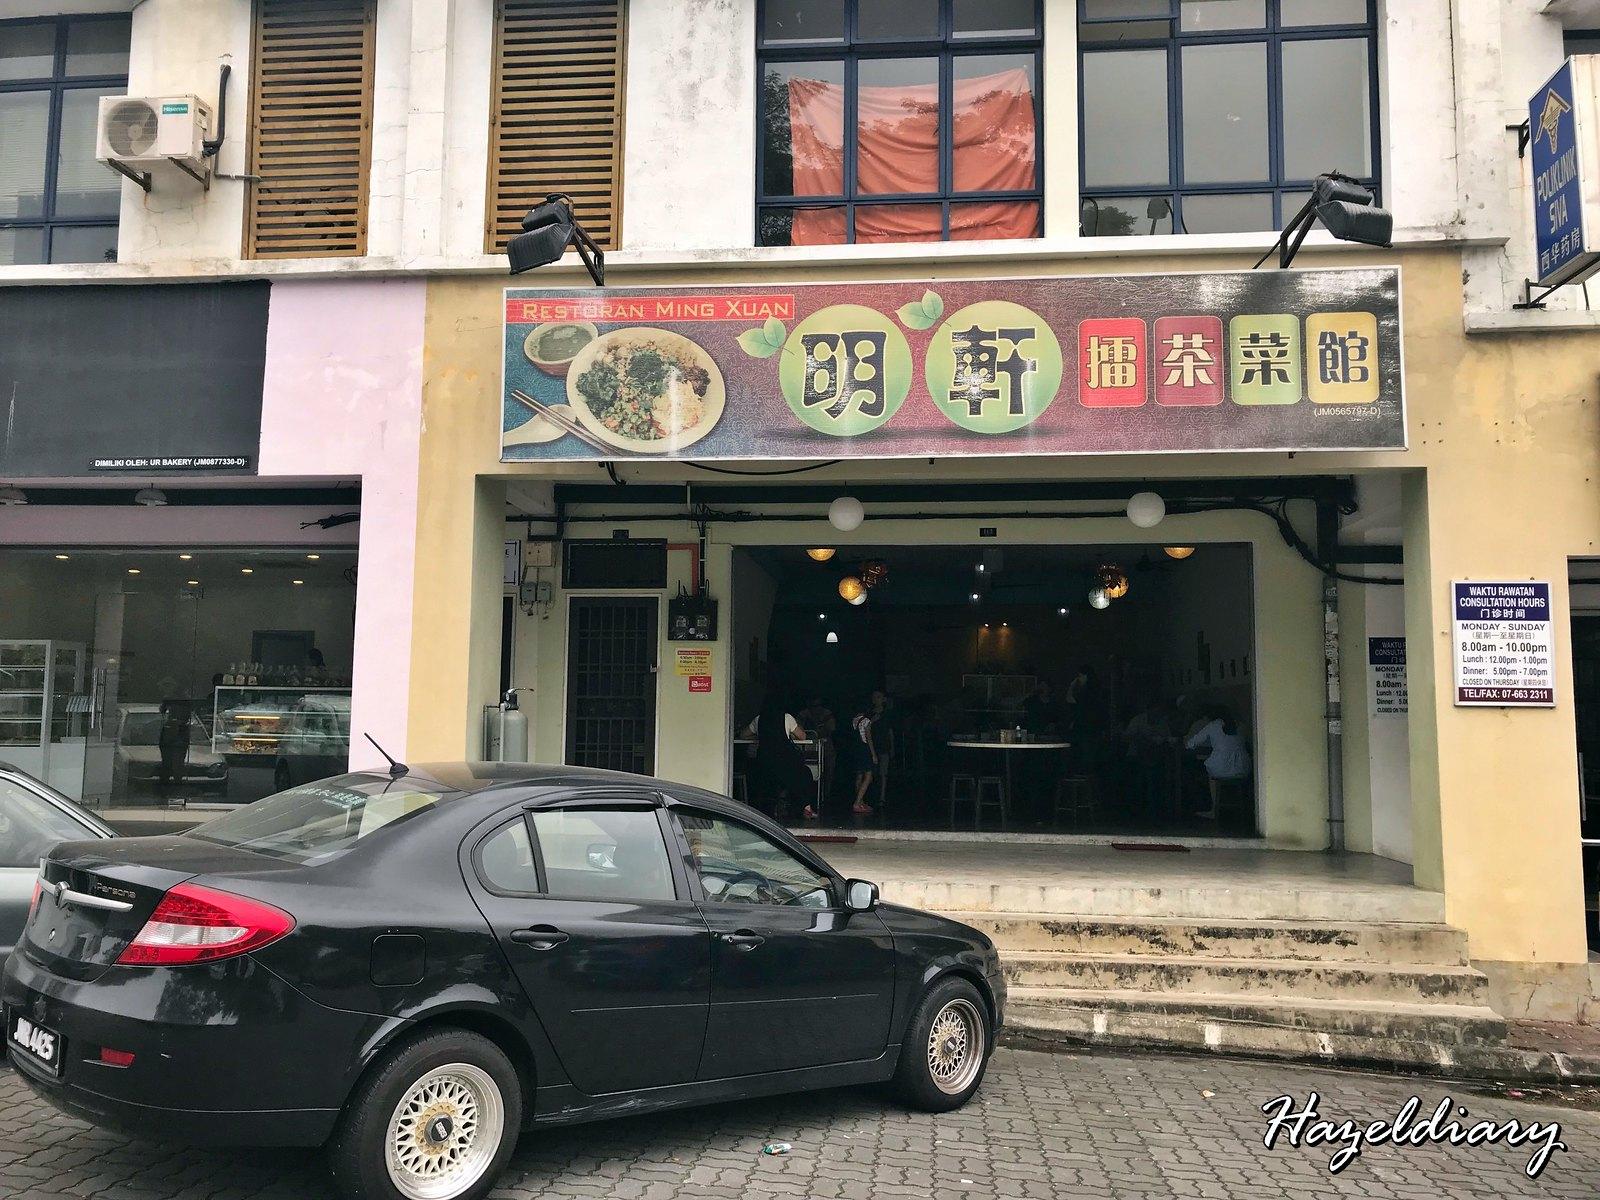 Restoran Ming Xuan-Lei Cha Fan Kulai-2